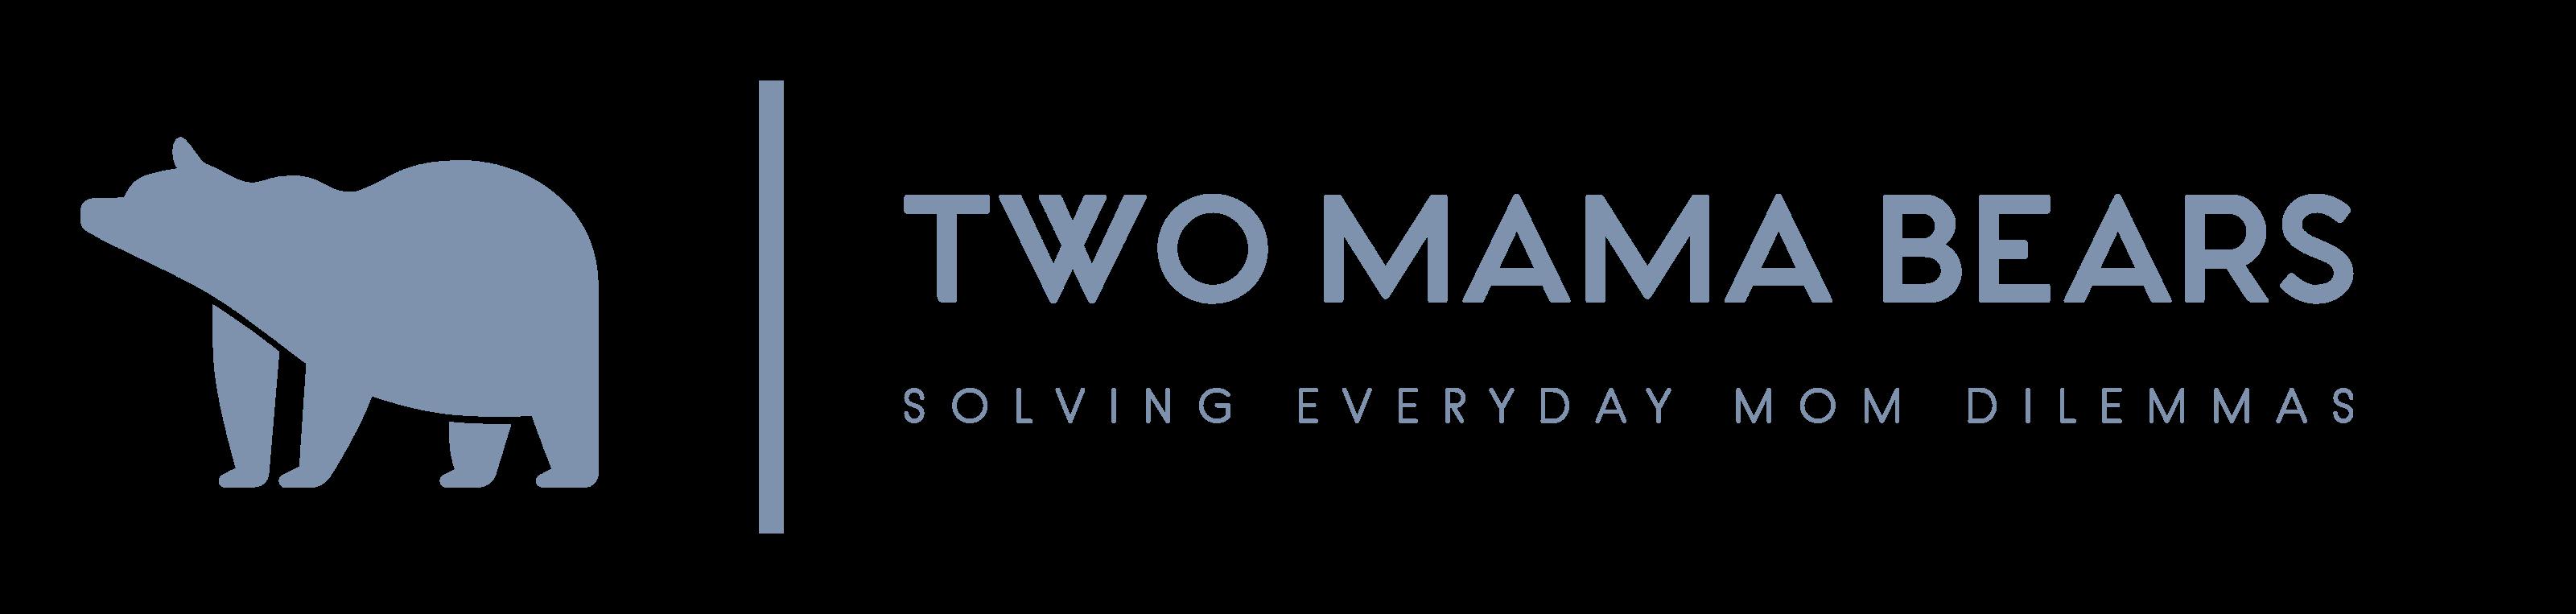 Two Mama Bears Color Logo